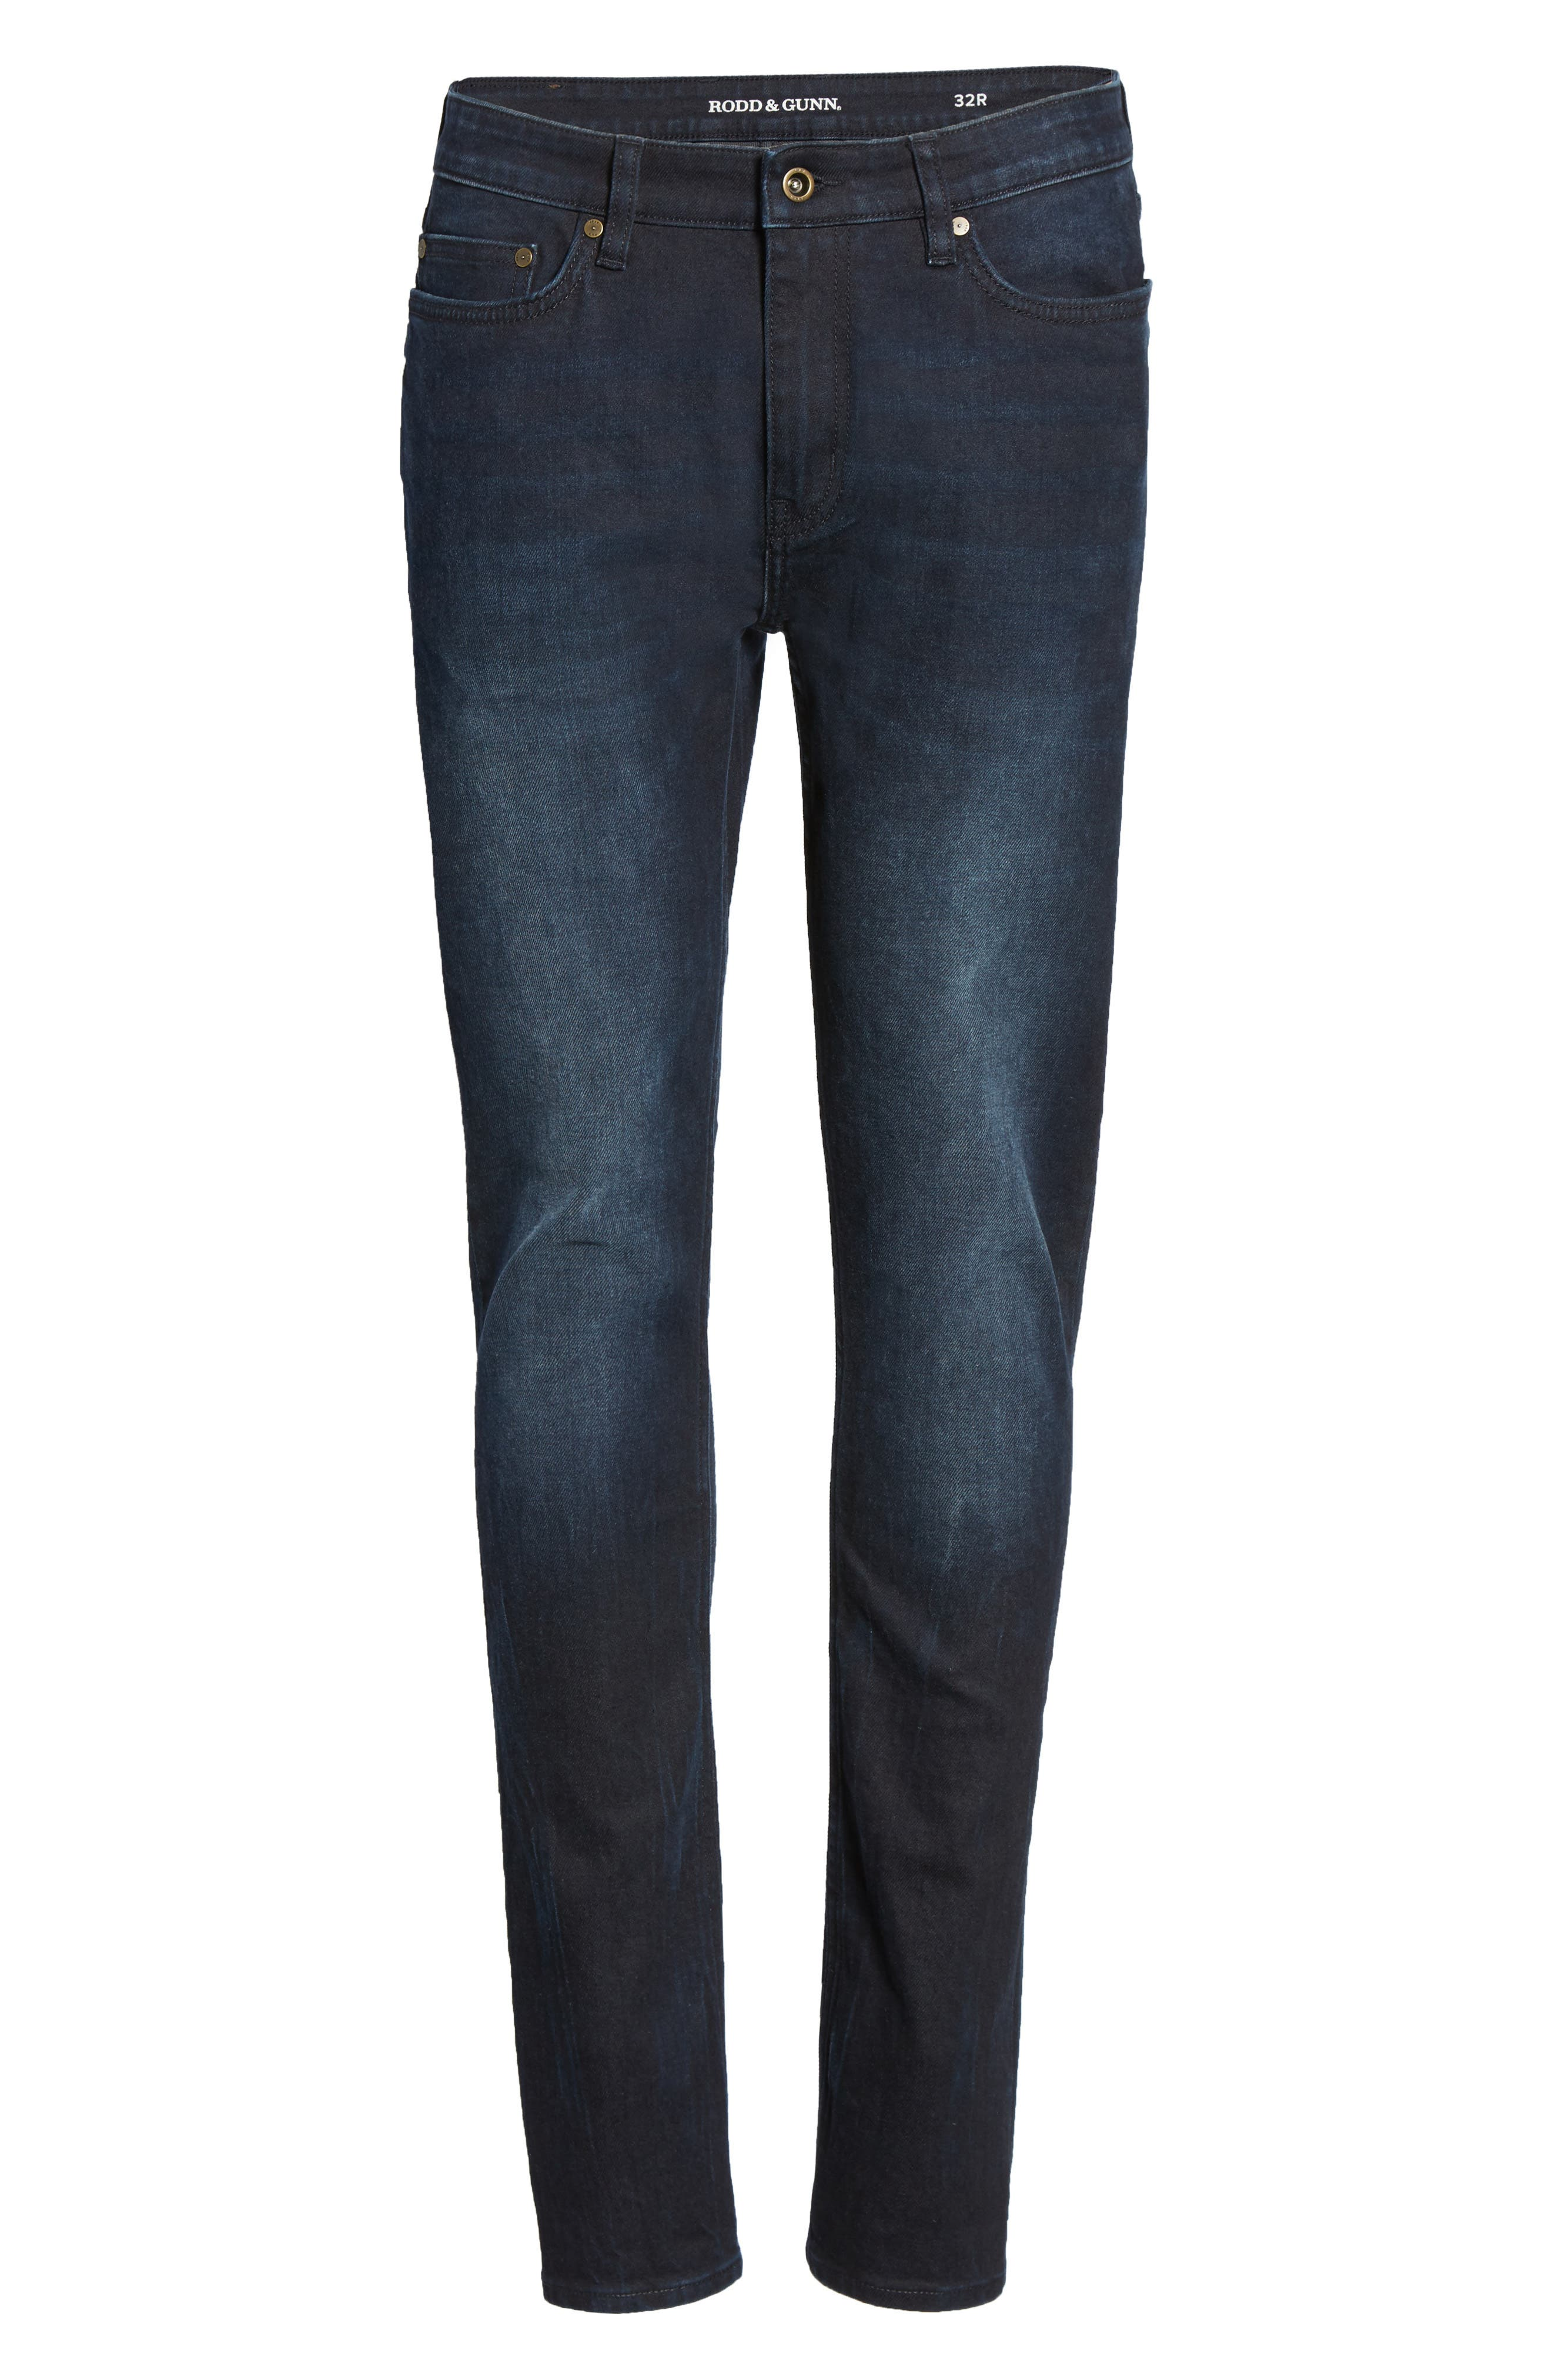 Mapleton Slim Fit Jeans,                             Alternate thumbnail 6, color,                             DENIM